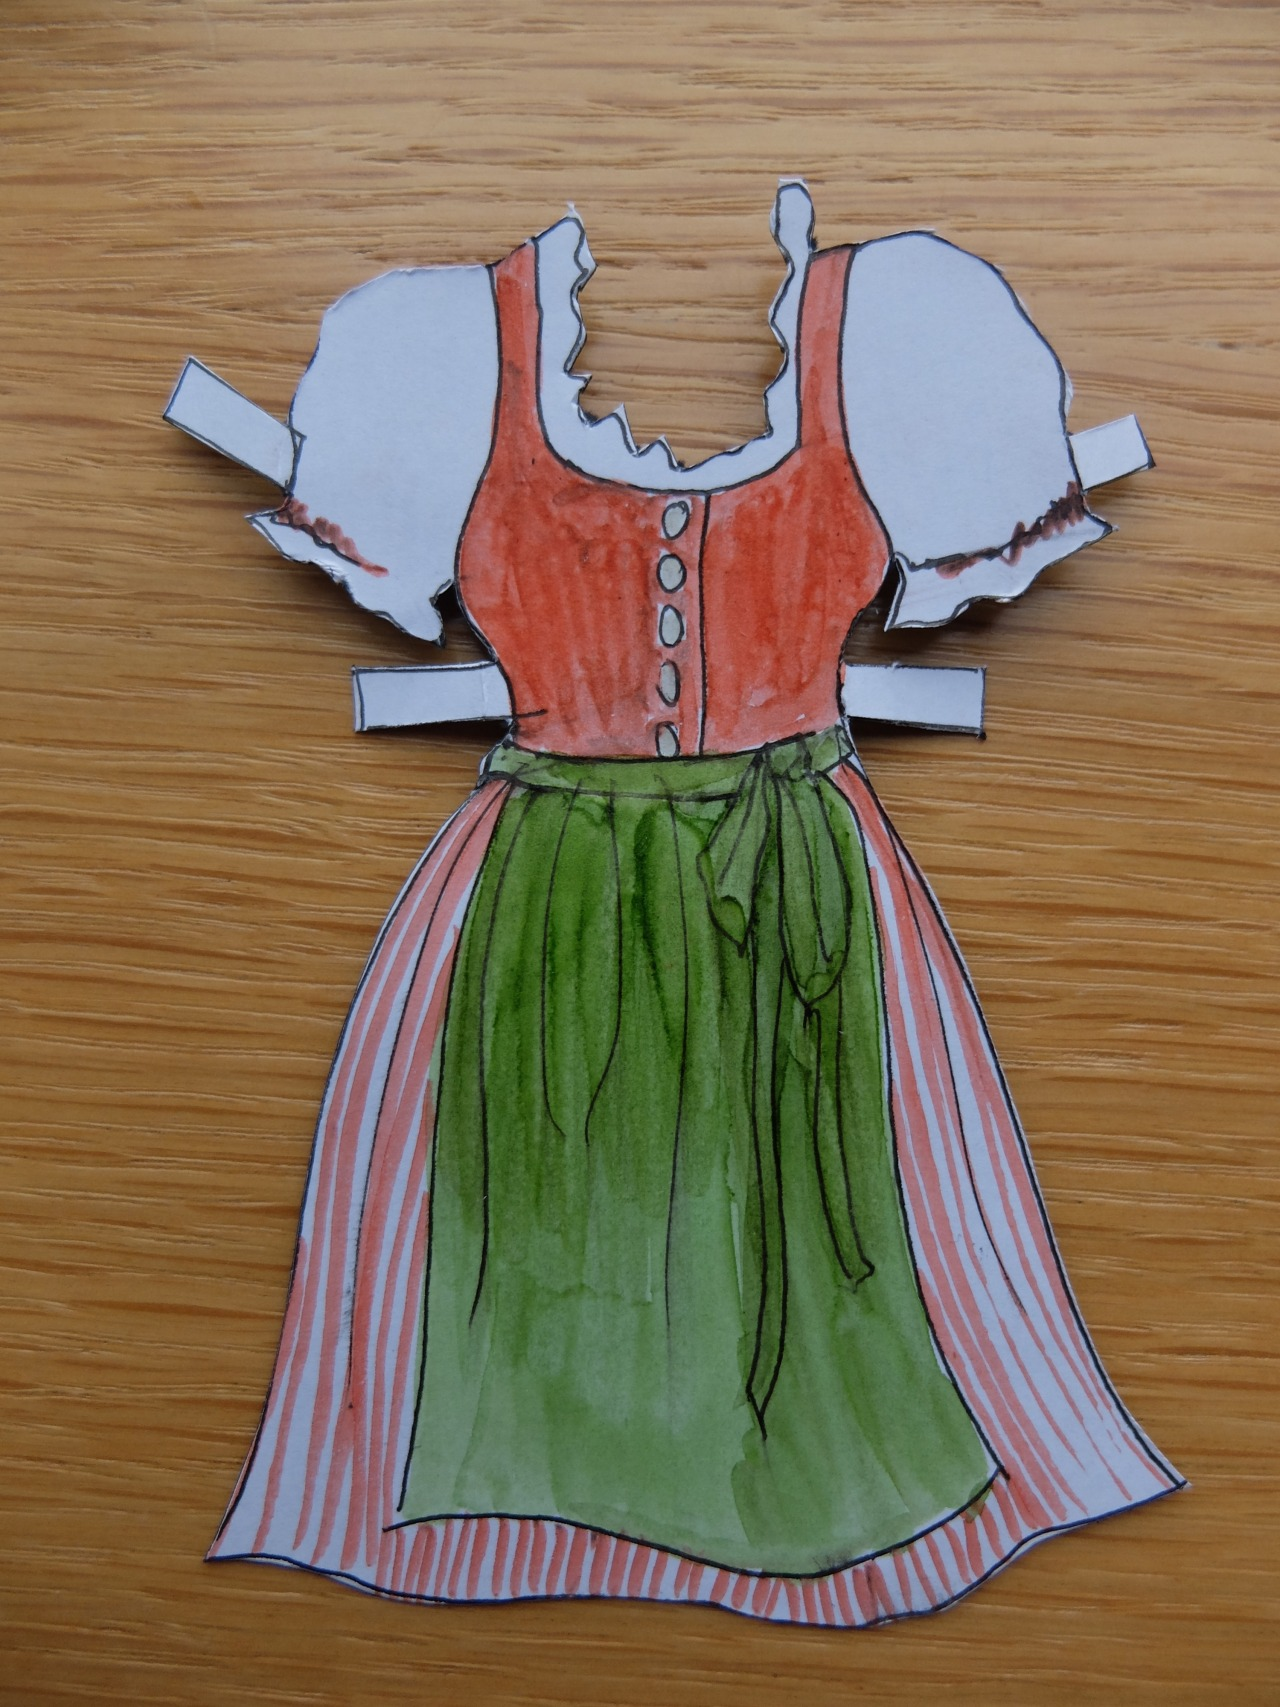 mangia minga // 'birthday voucher for a home-sewn Dirndl'